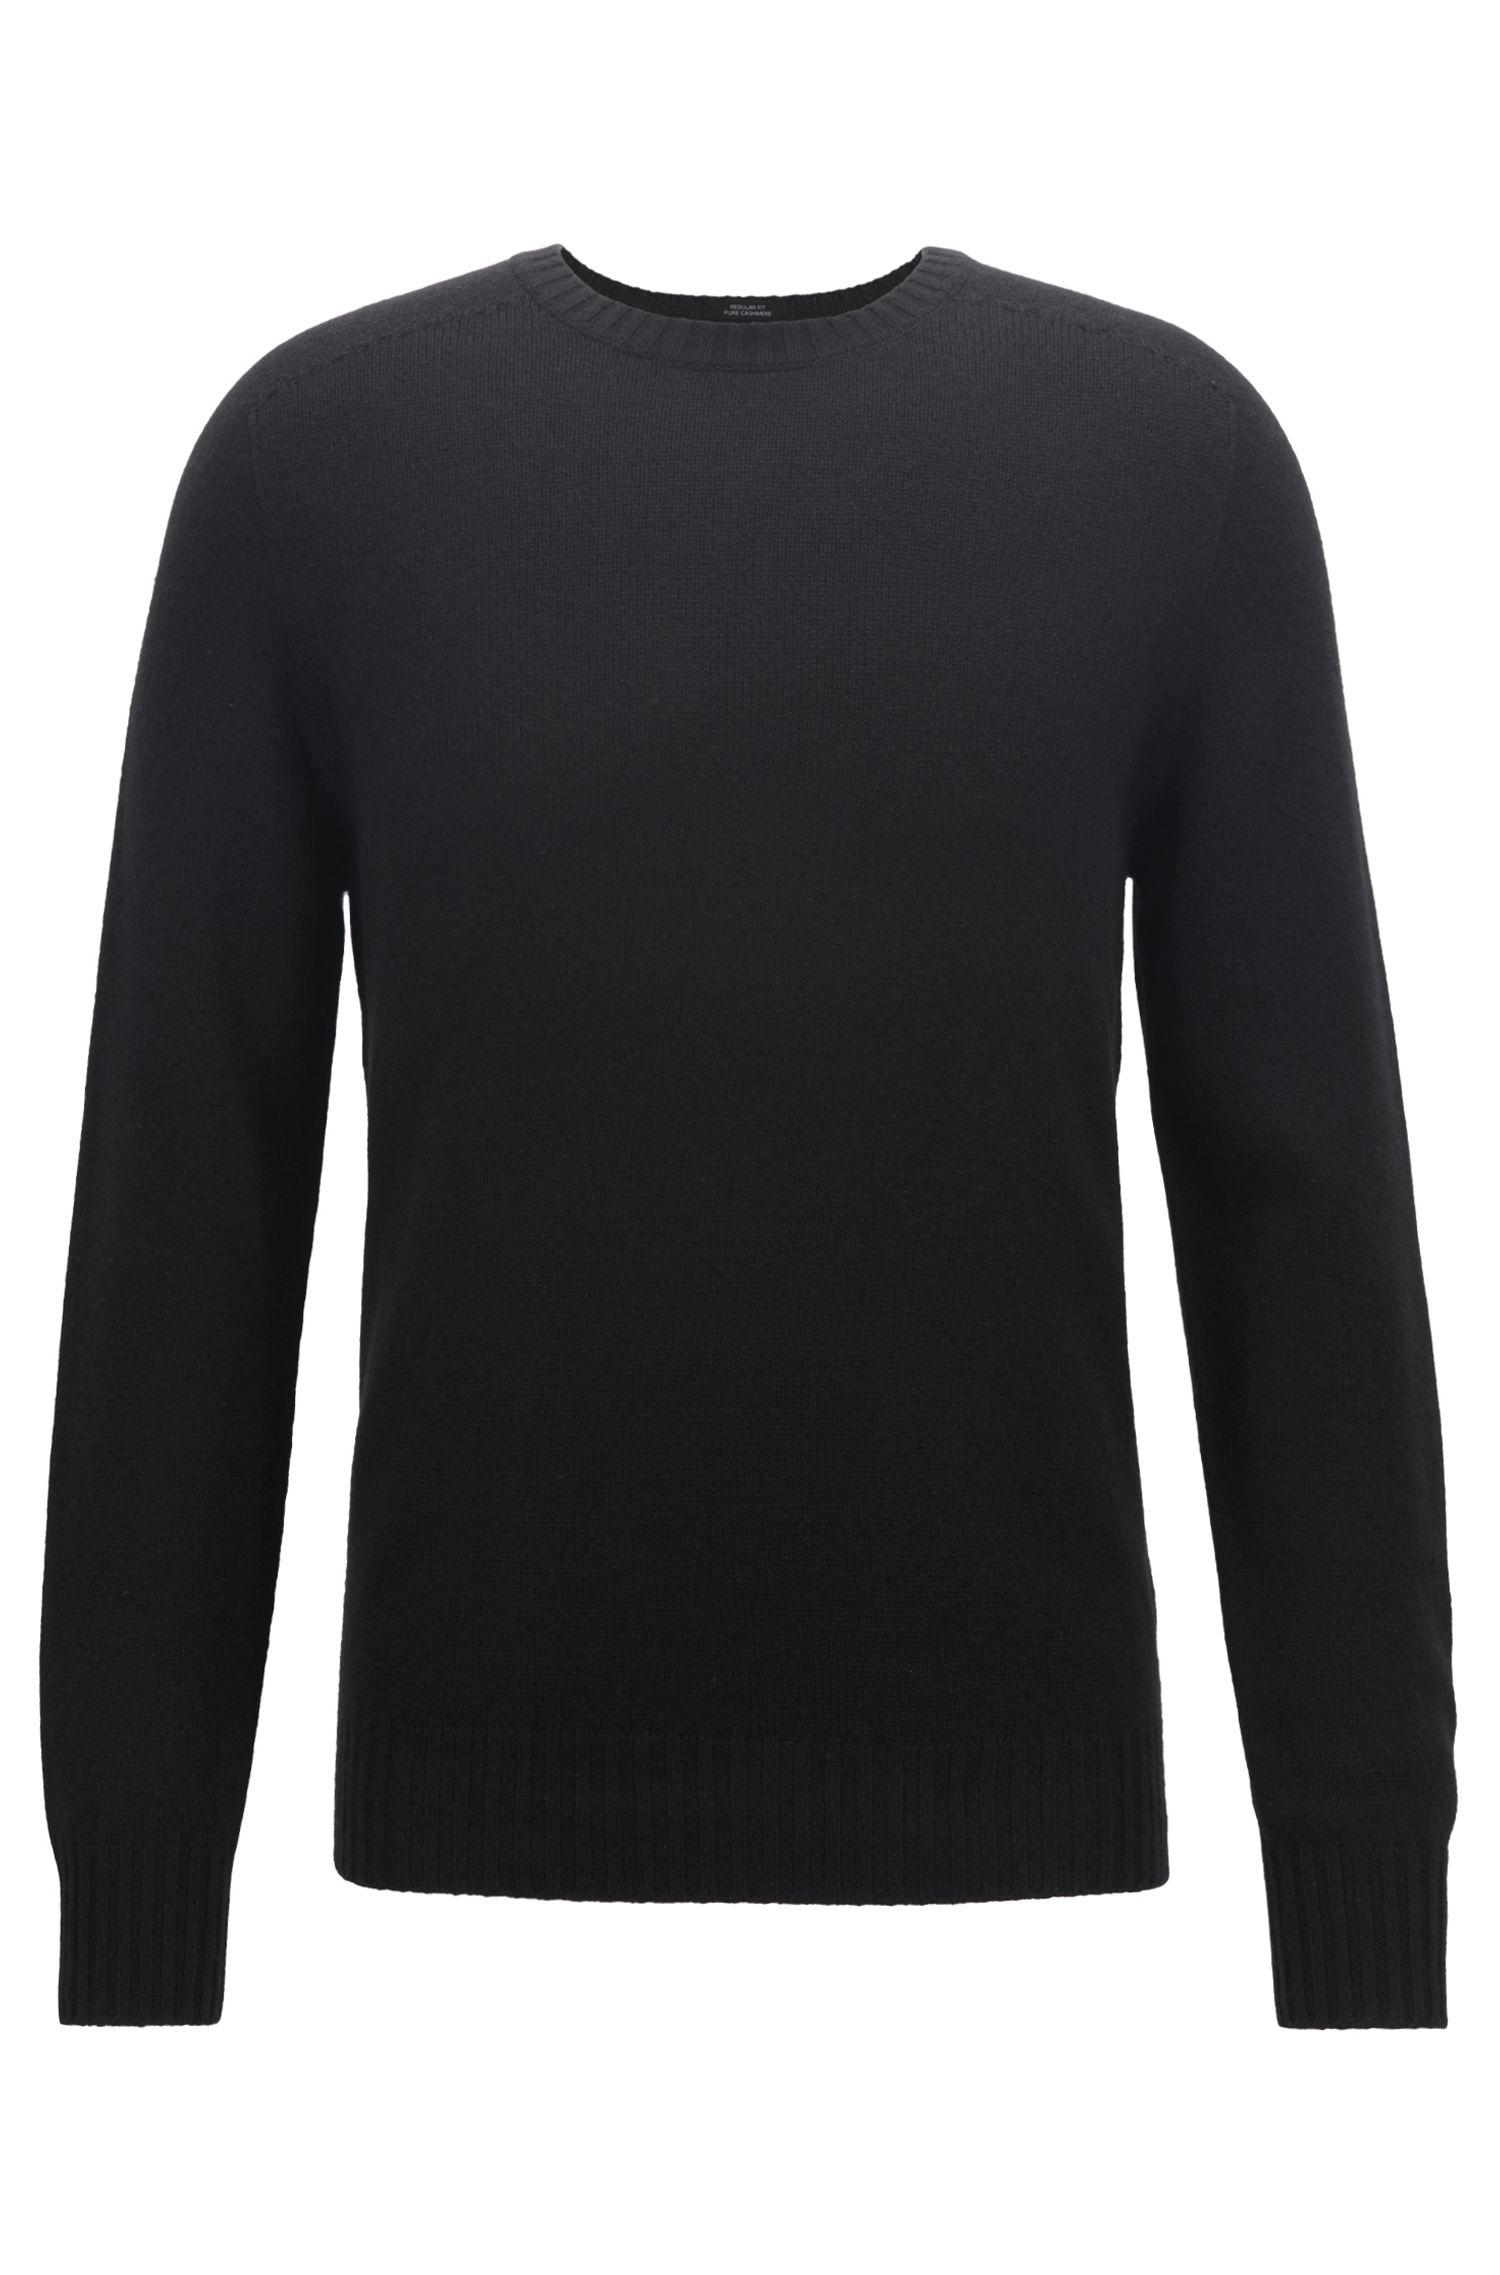 Cashmere sweater with seam-free design, Black